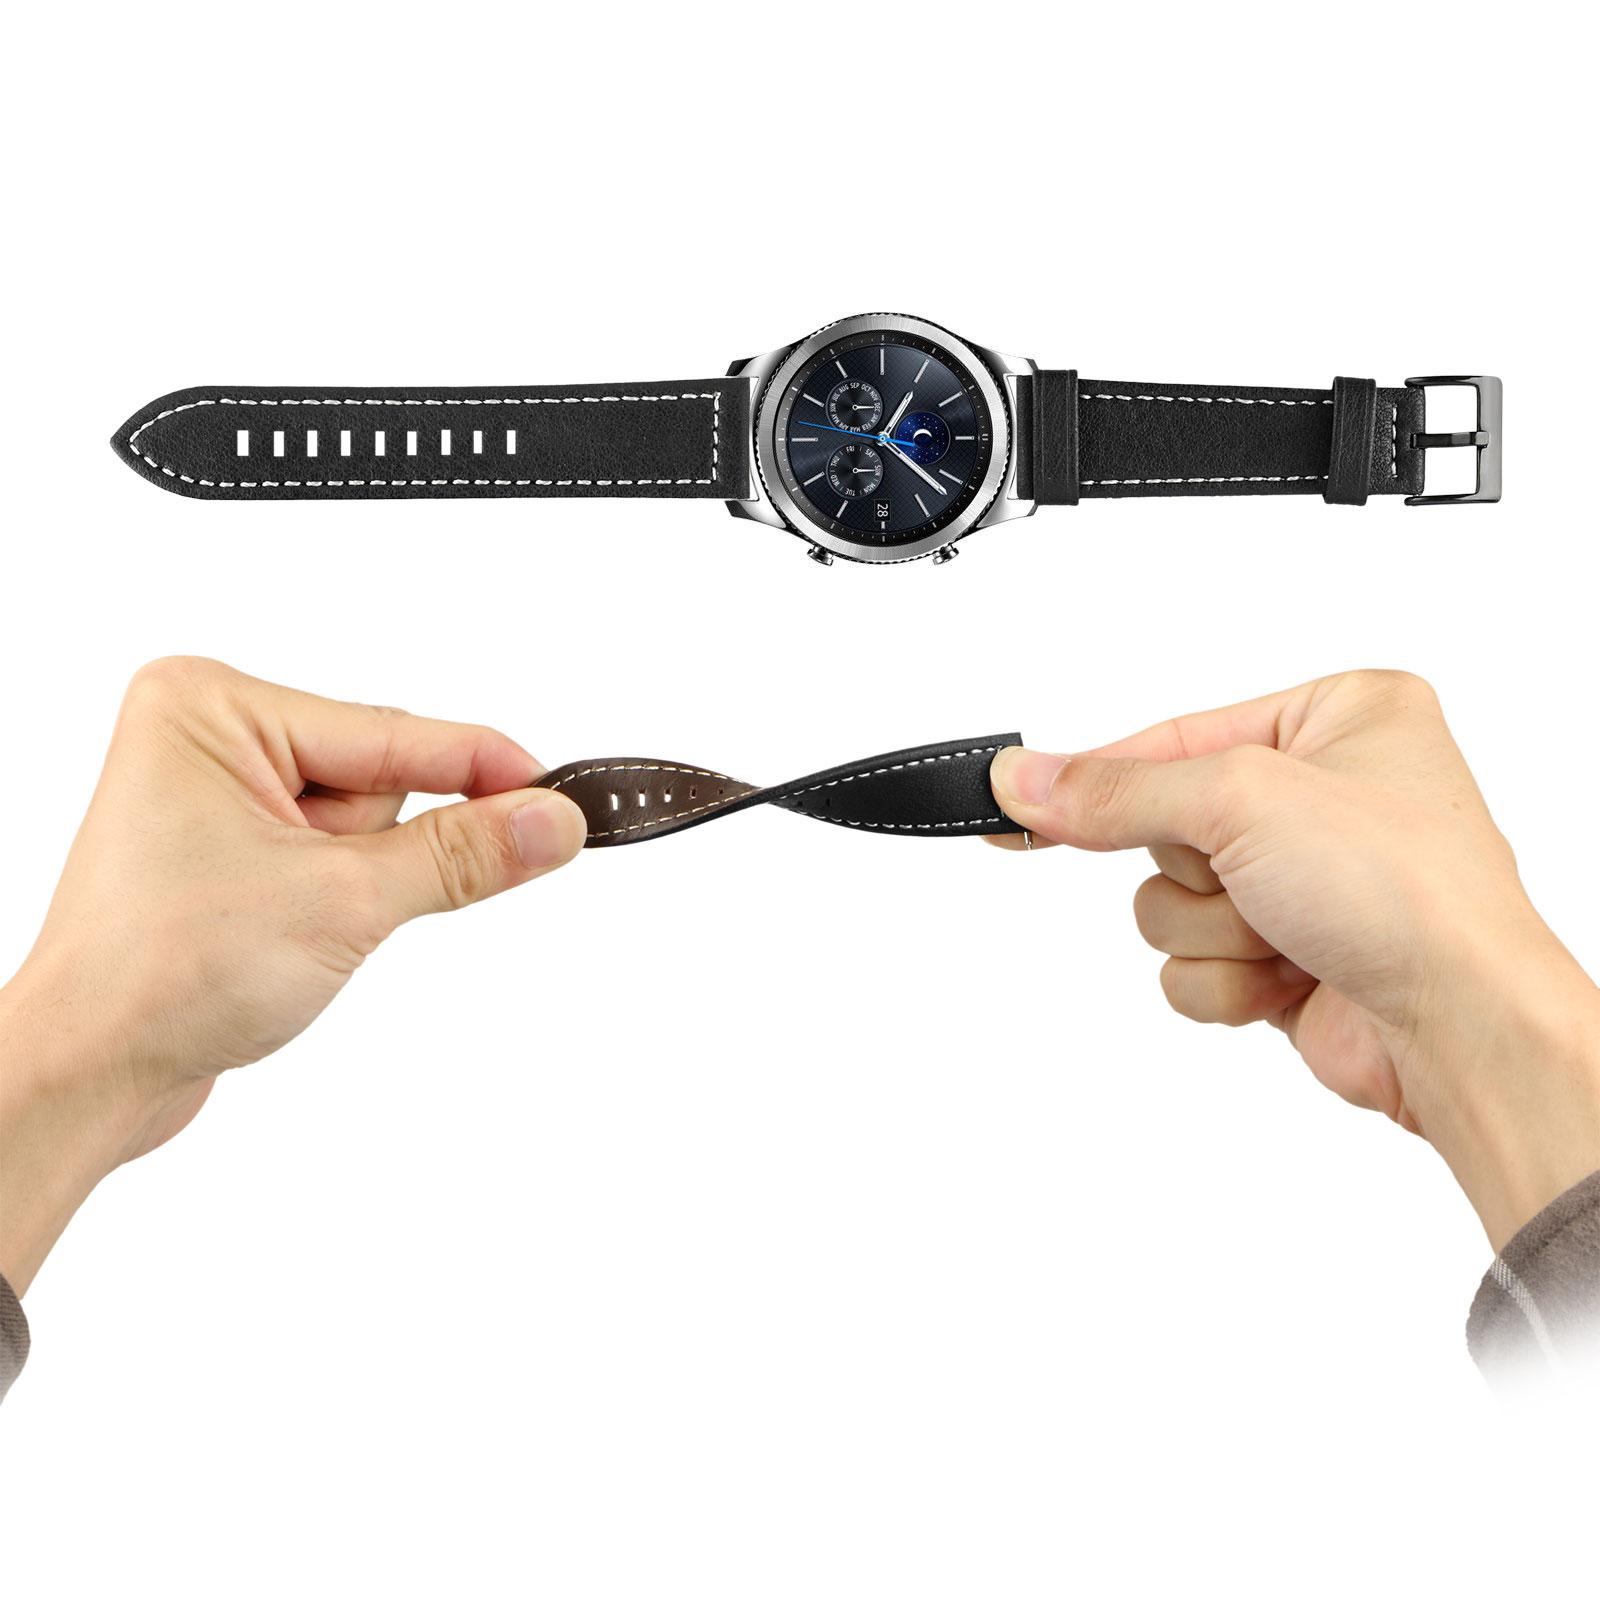 Luxury-Leather-Wrist-Strap-Band-Bracelet-For-Samsung-Galaxy-Watch-42mm-46mm